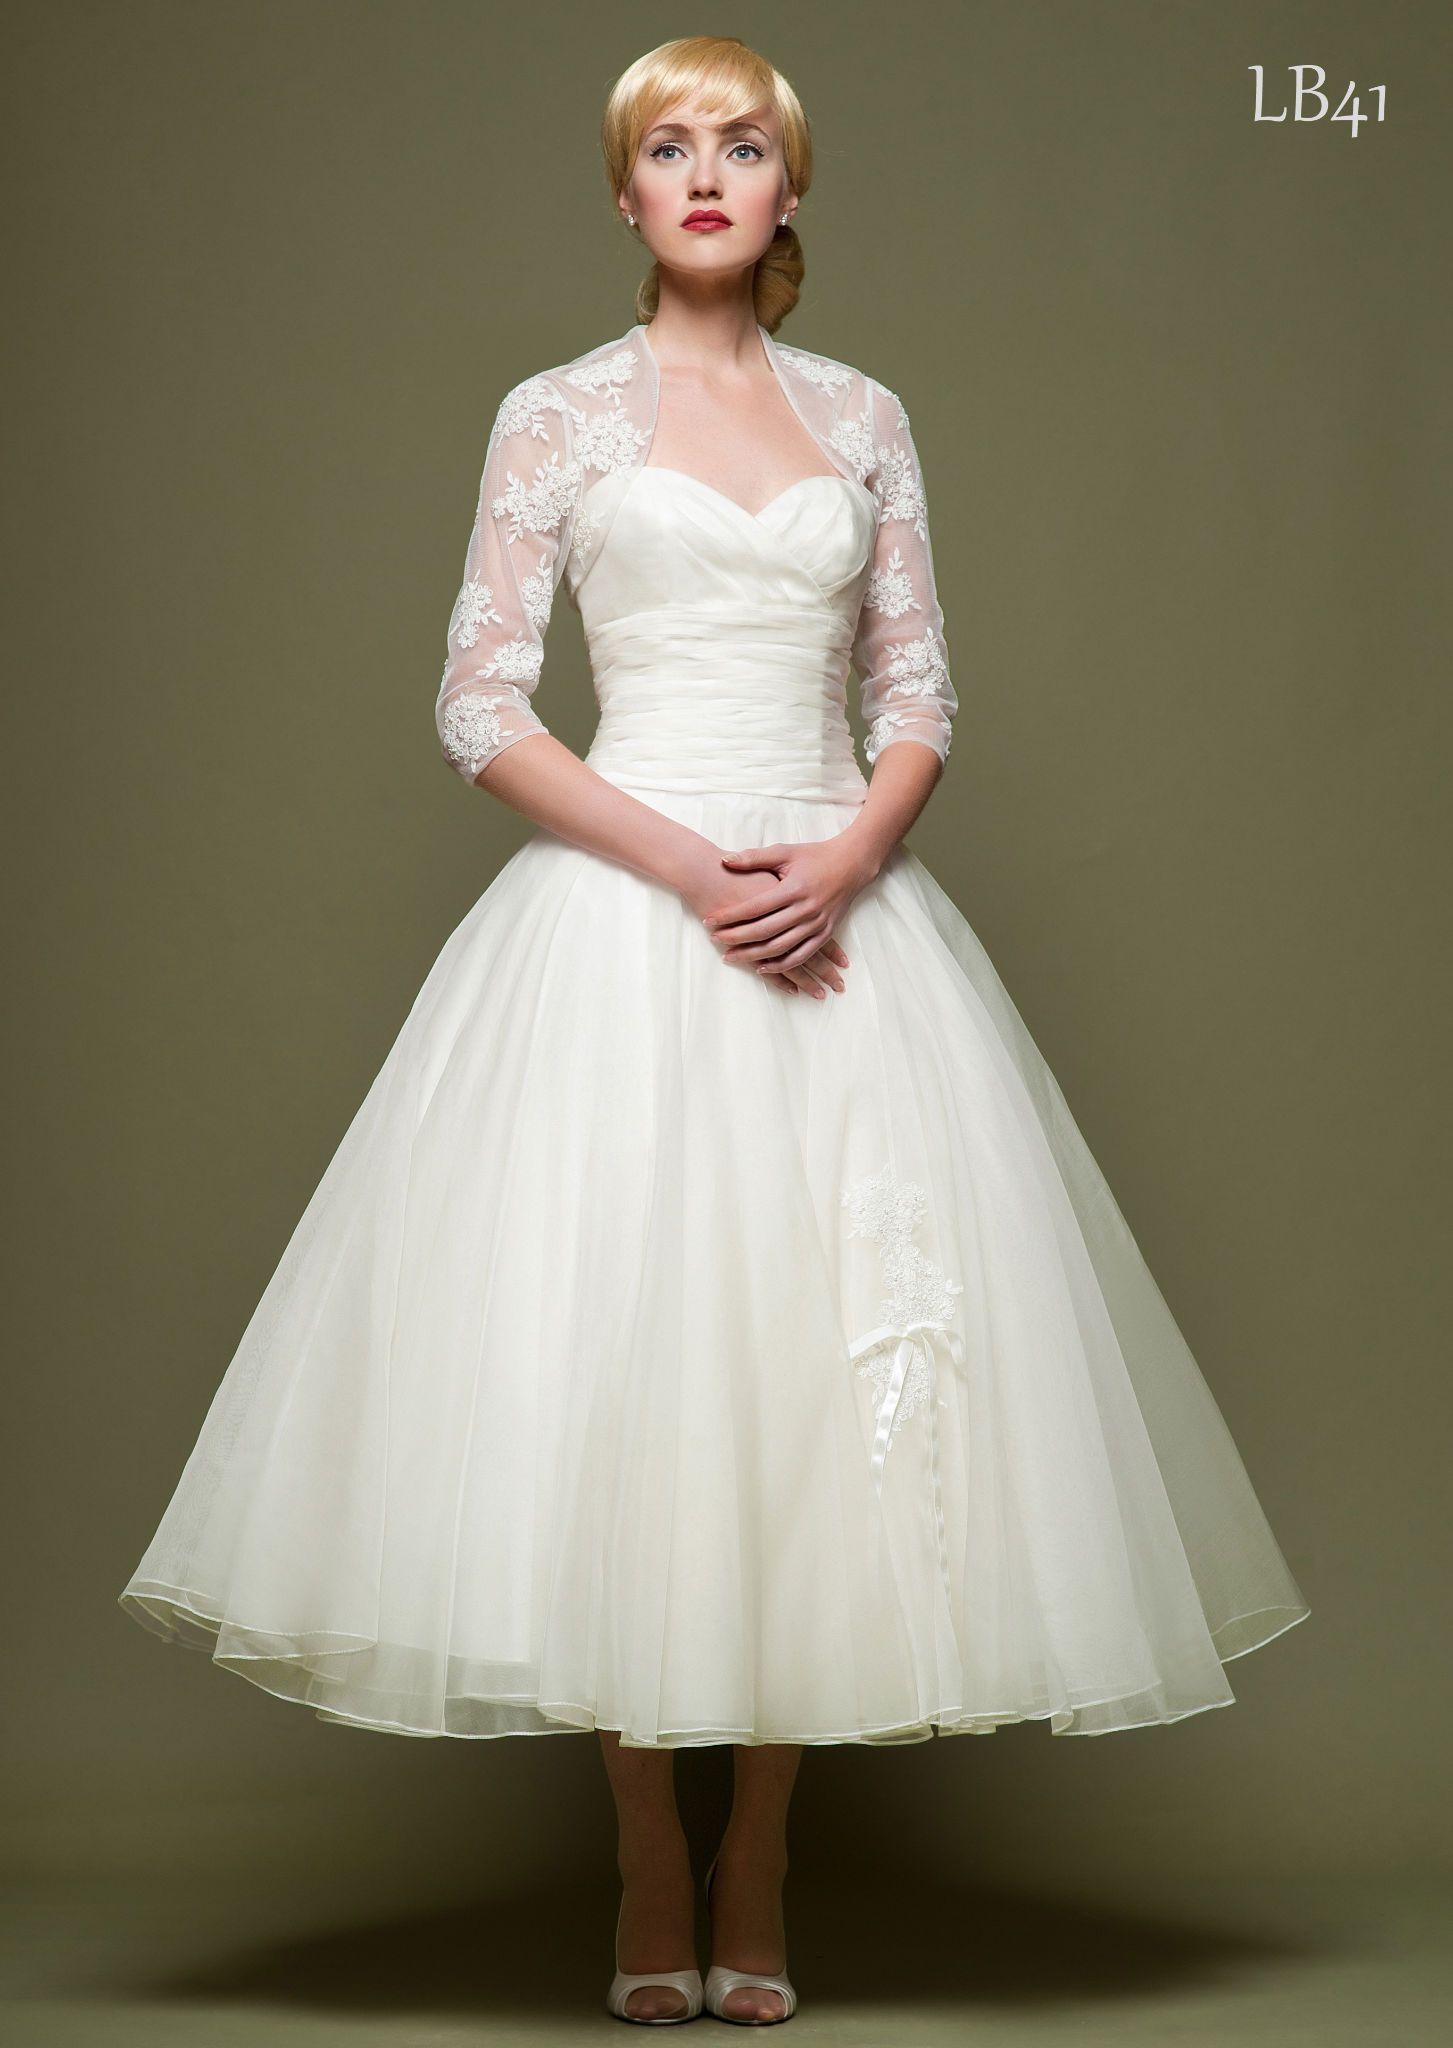 Sally Lacock Vintage Inspired Wedding Dress Collection Wedding Inspirasi Edwardian Wedding Dress Edwardian Wedding Vintage Inspired Wedding Dresses